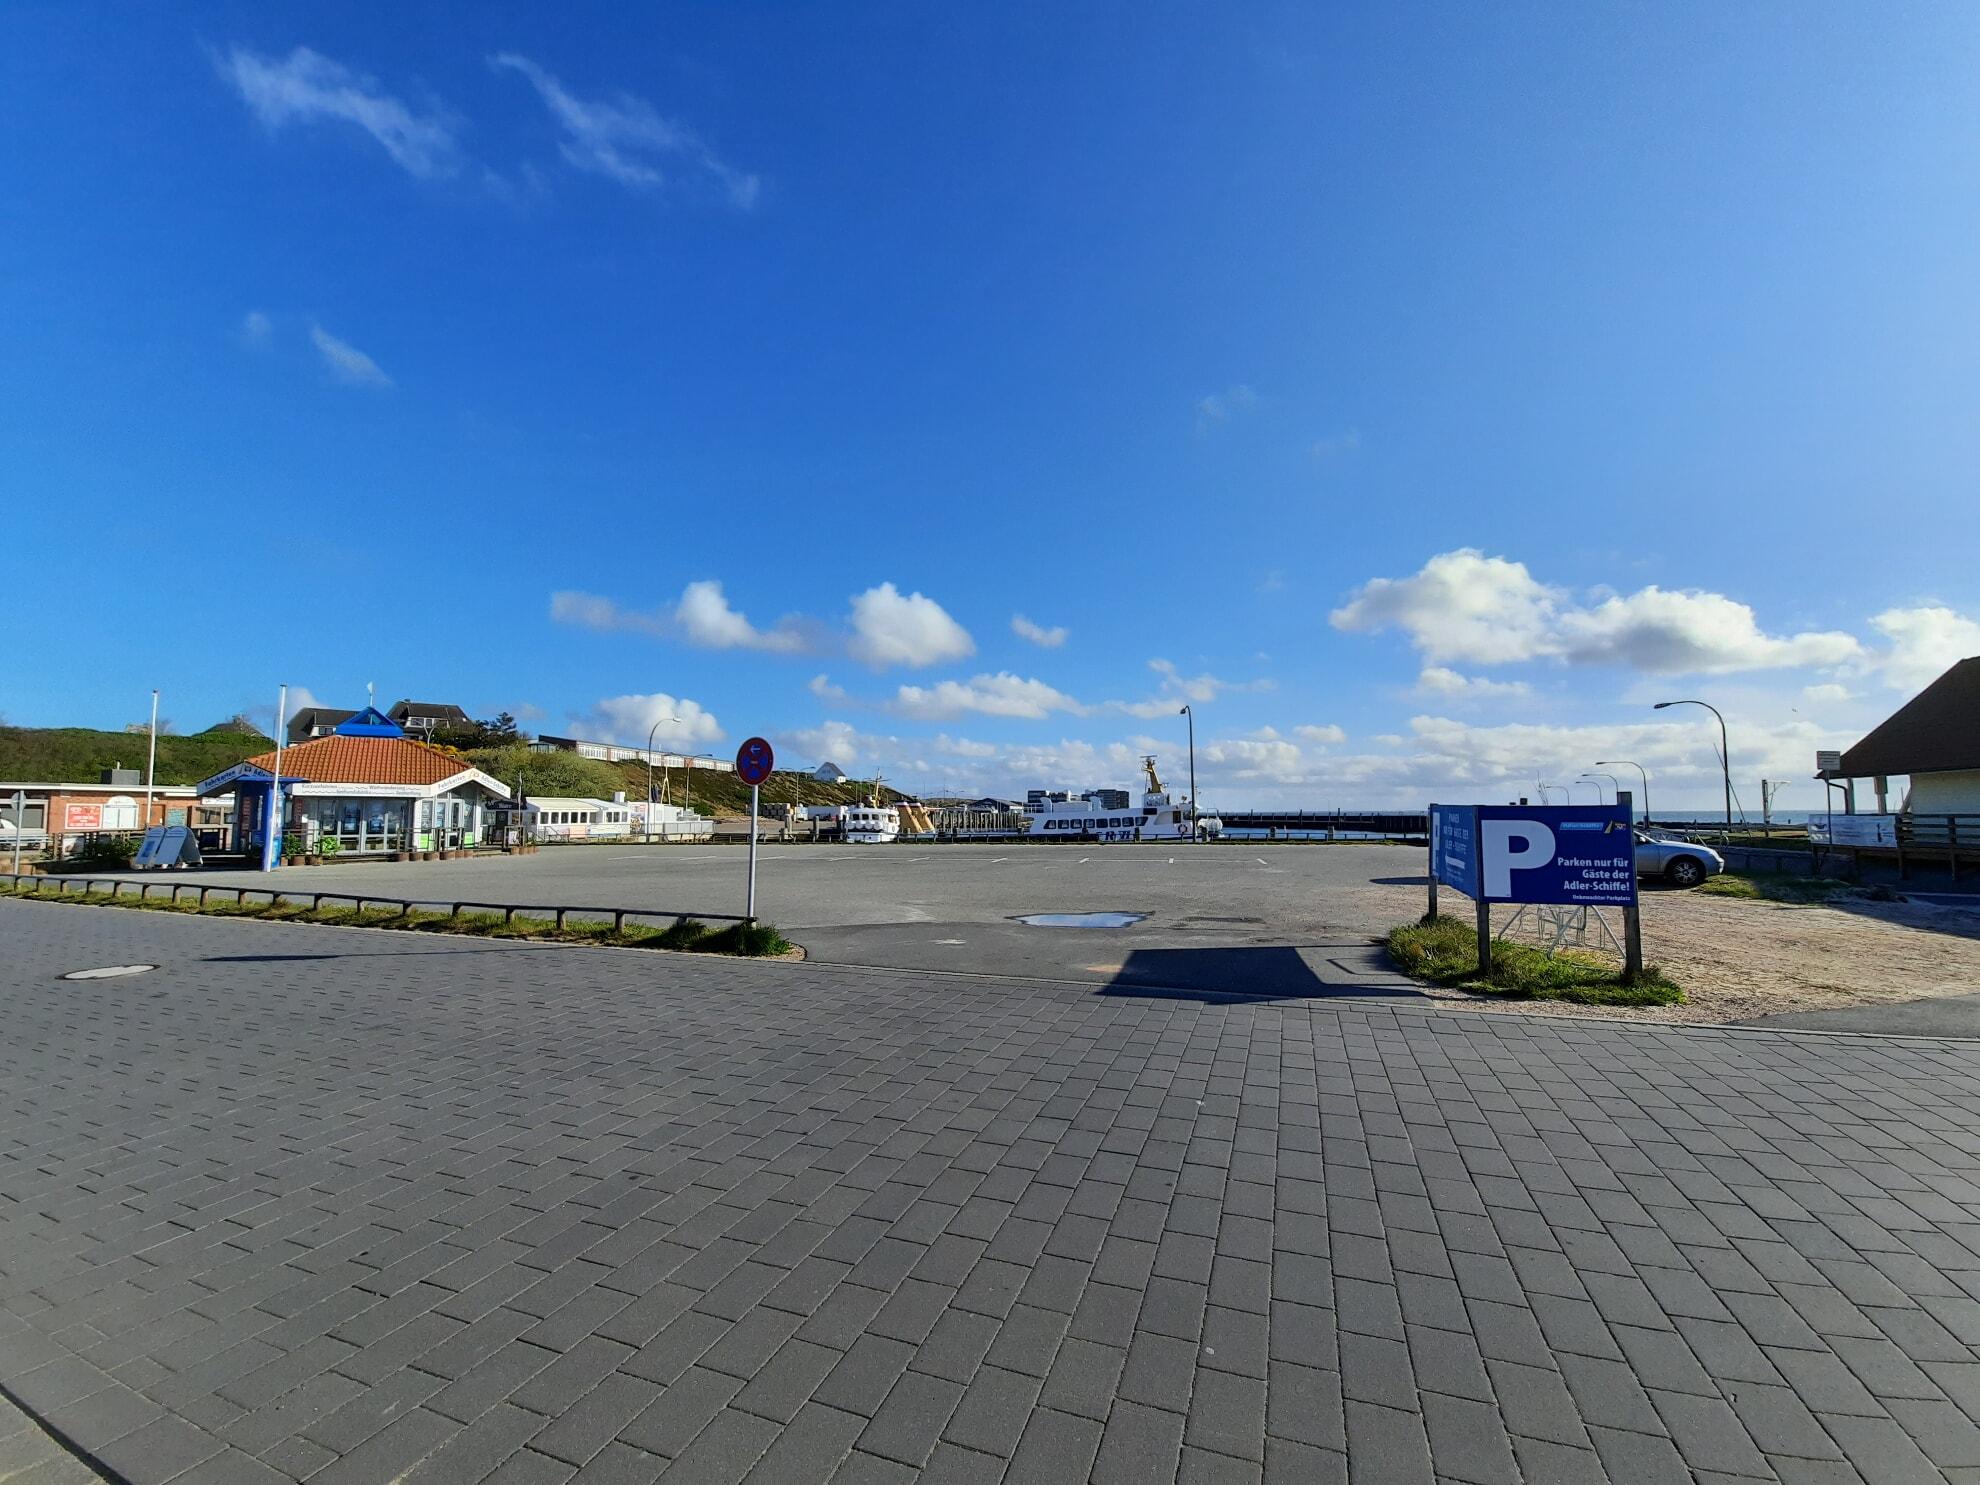 parkplatz_adler